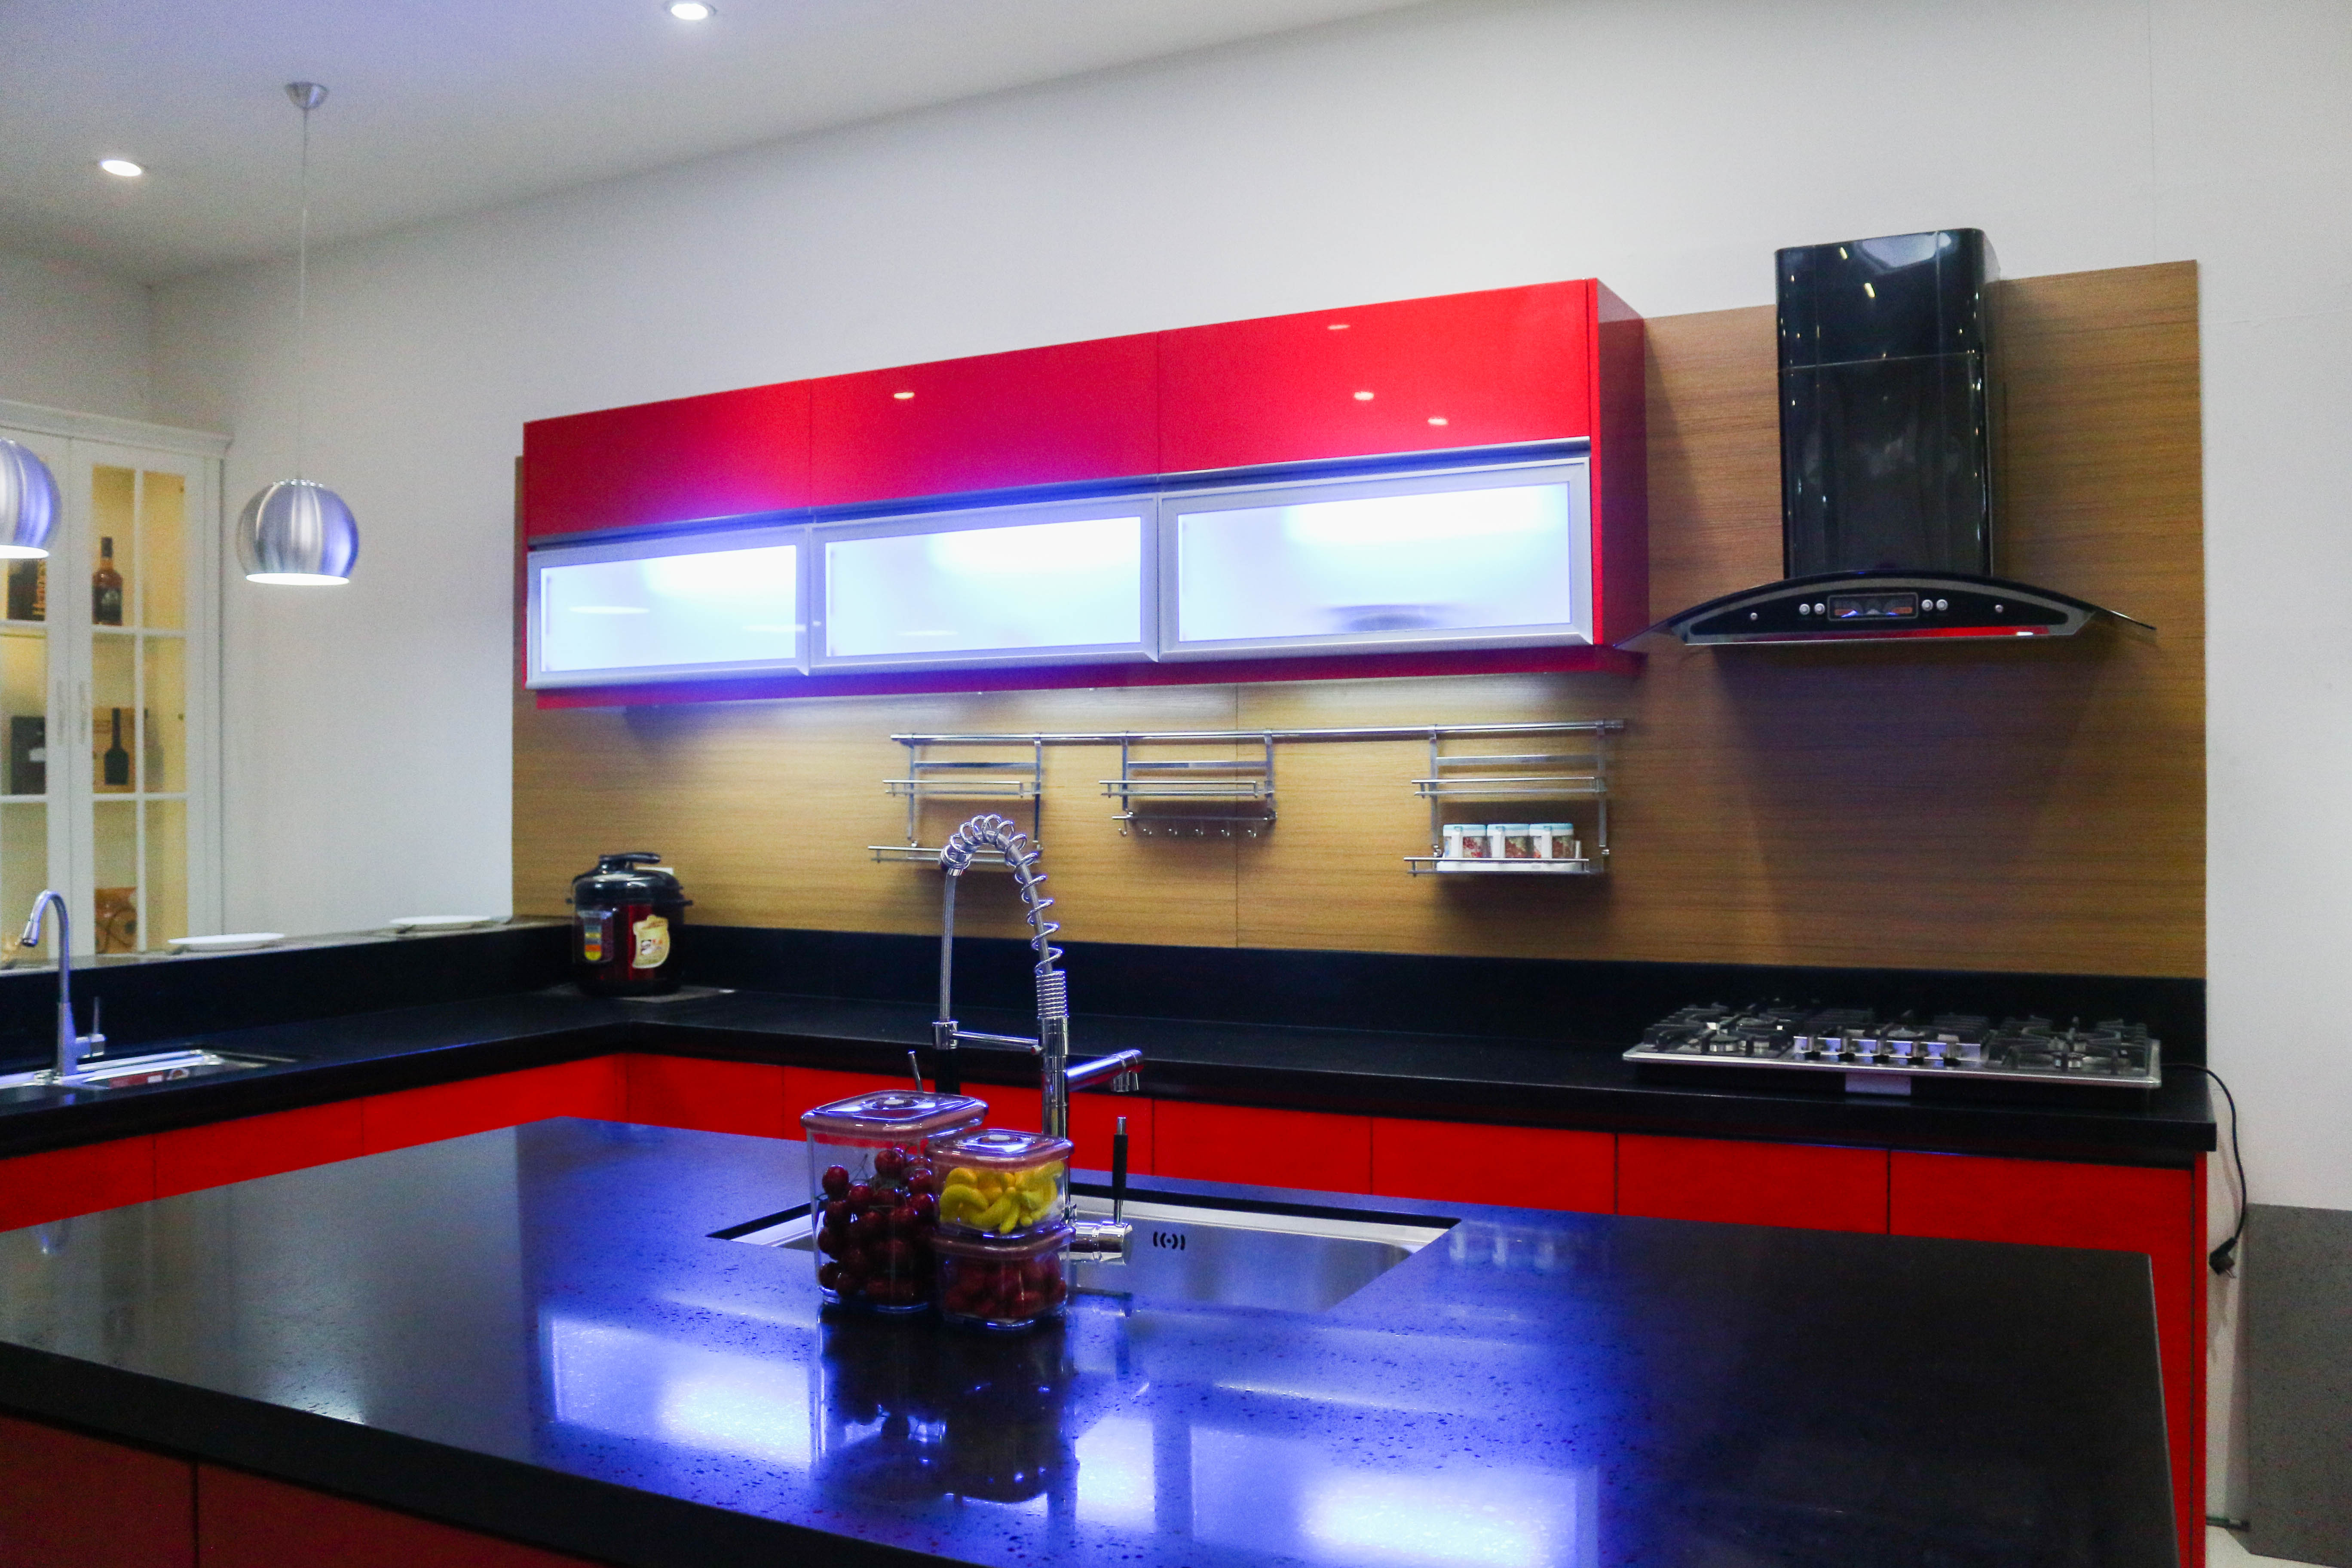 CW Home Depot Westgate Alabang